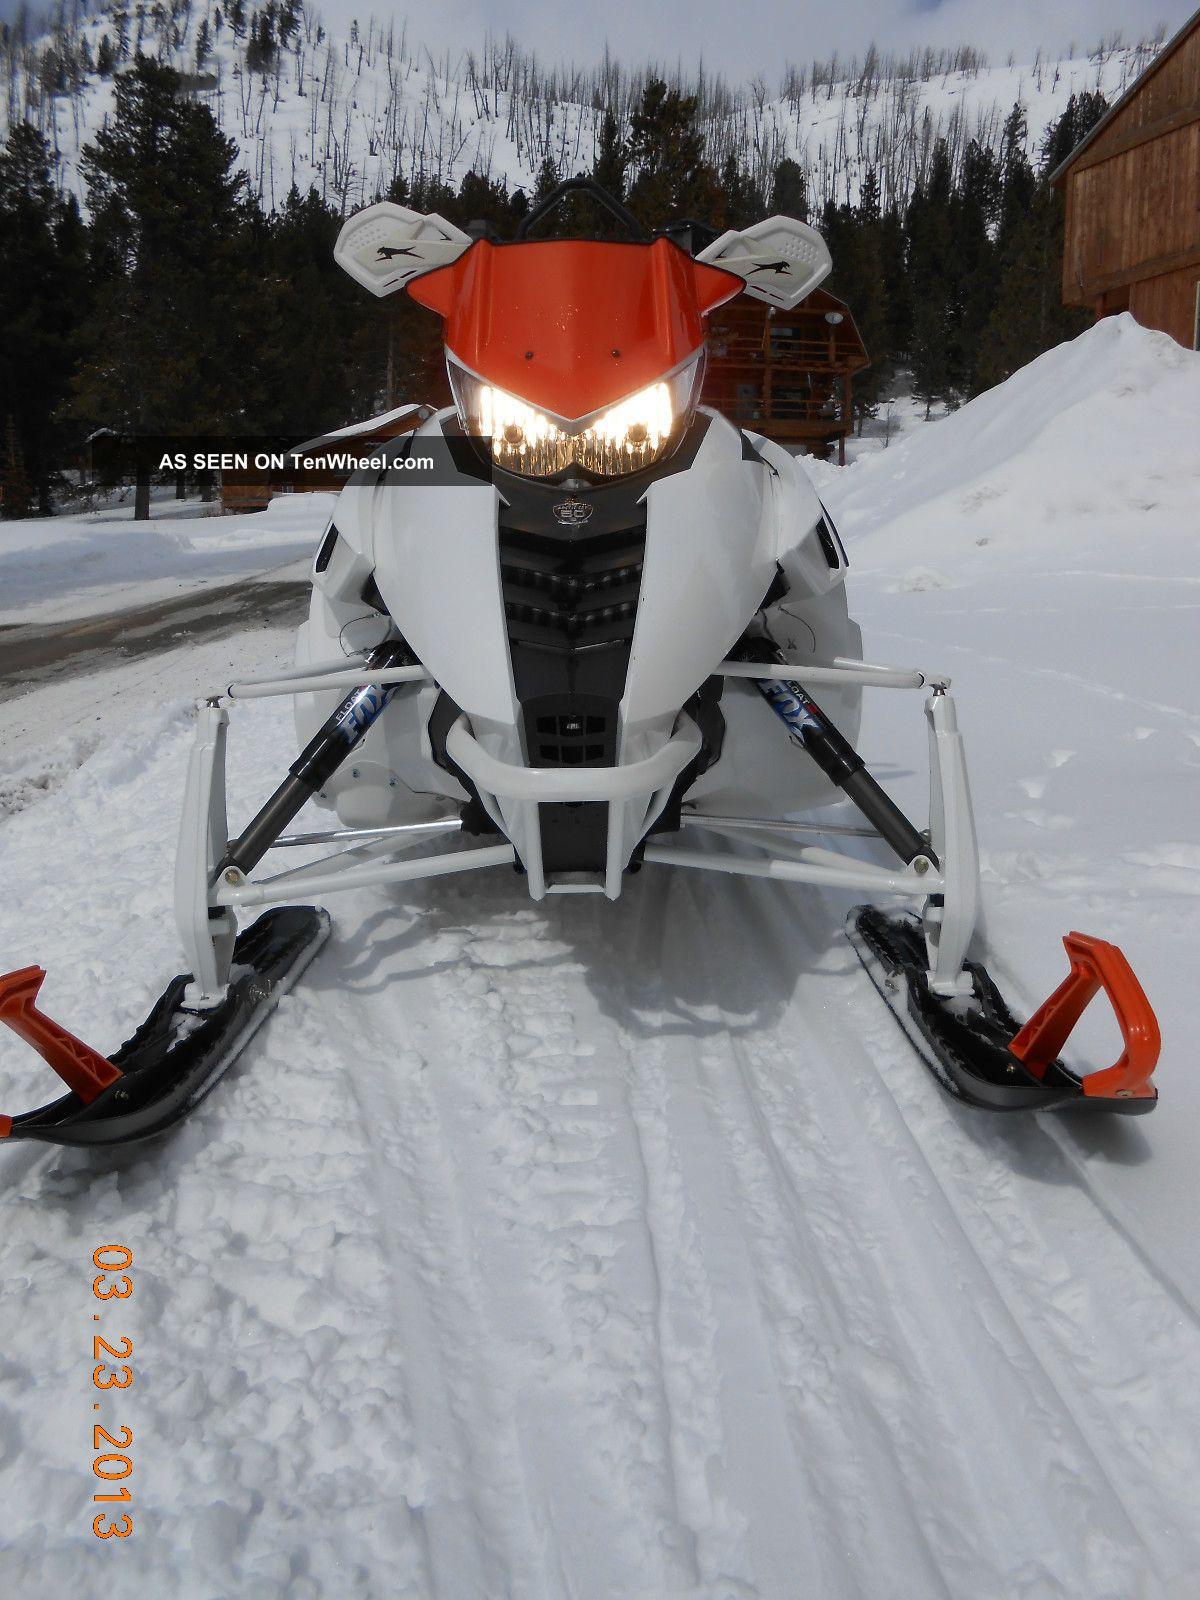 BMW Mountain View >> 2012 Arctic Cat M1100 Turbo 162 Snopro Ltd